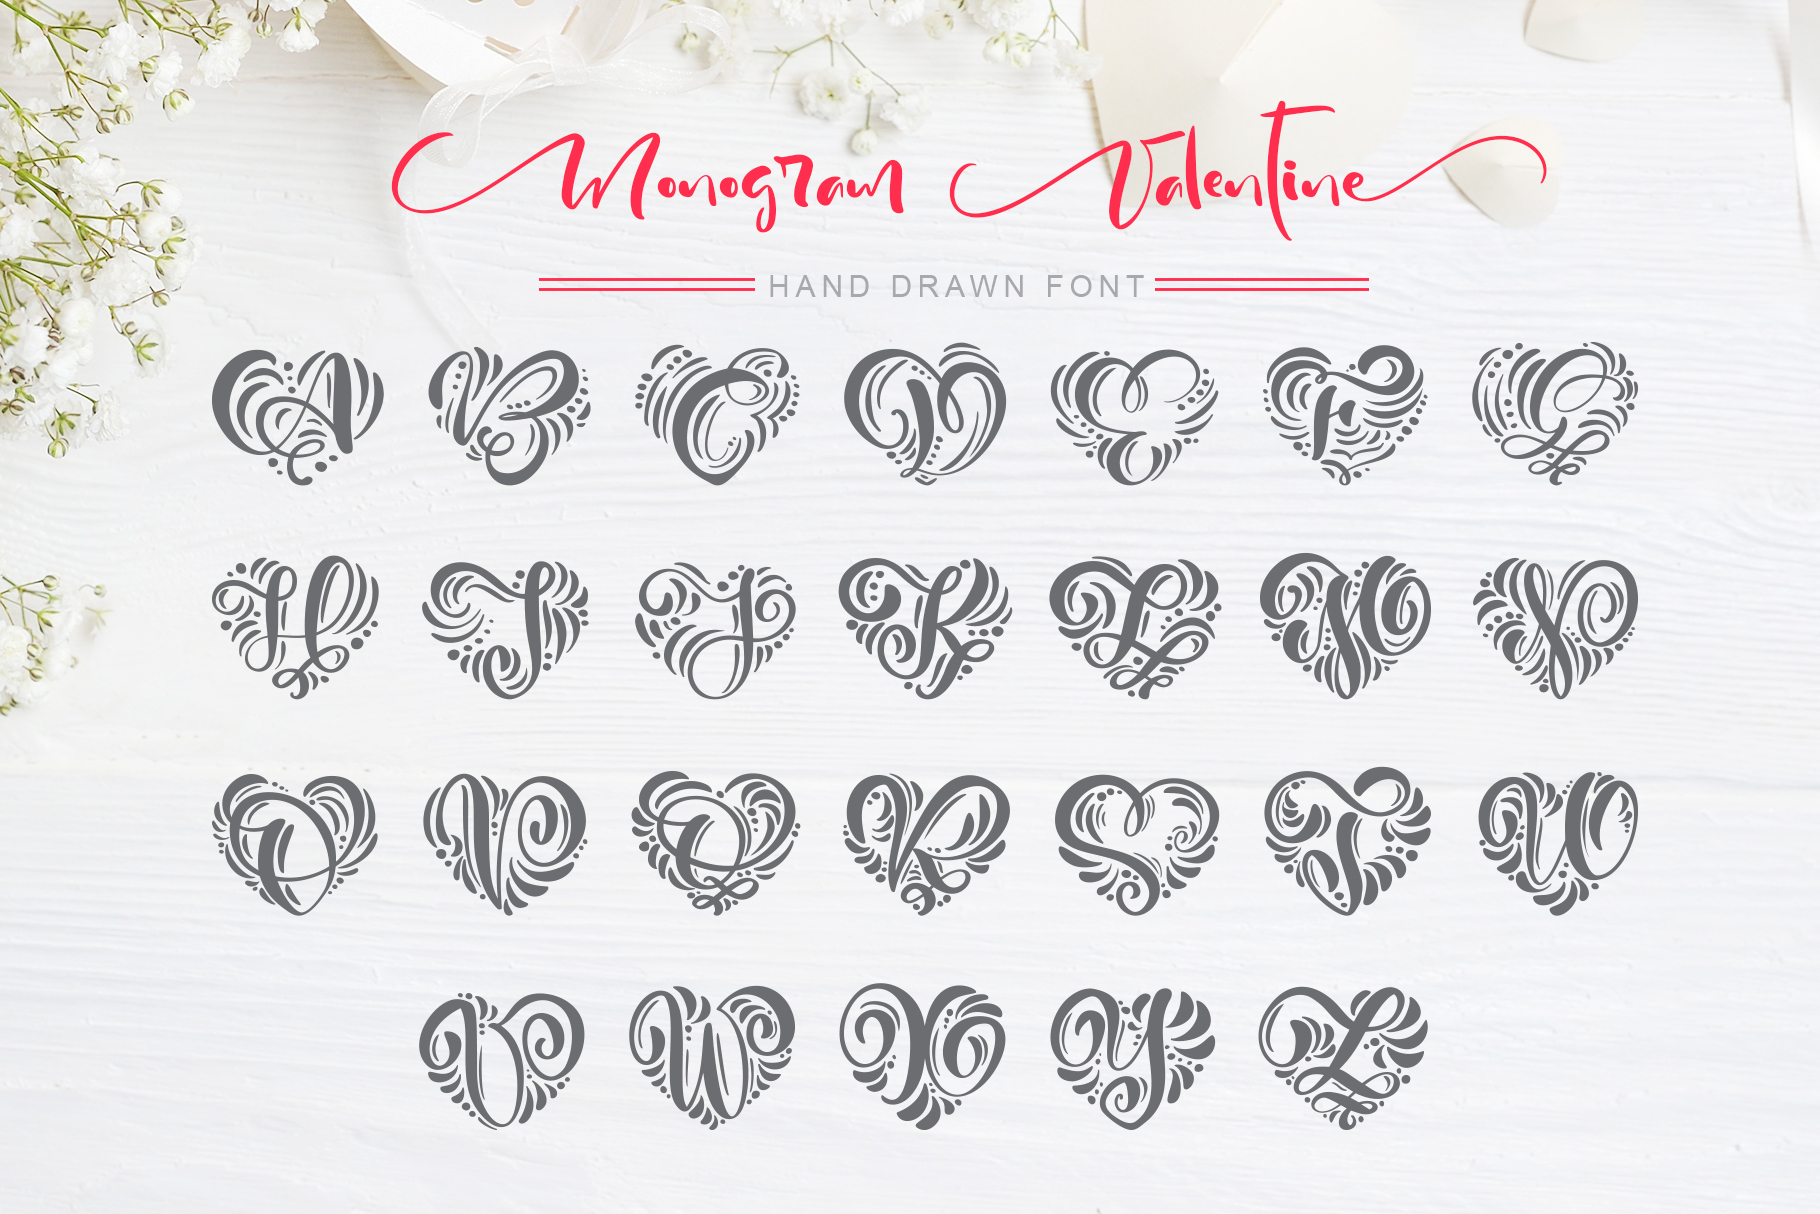 Monogram Valentine Font - title04